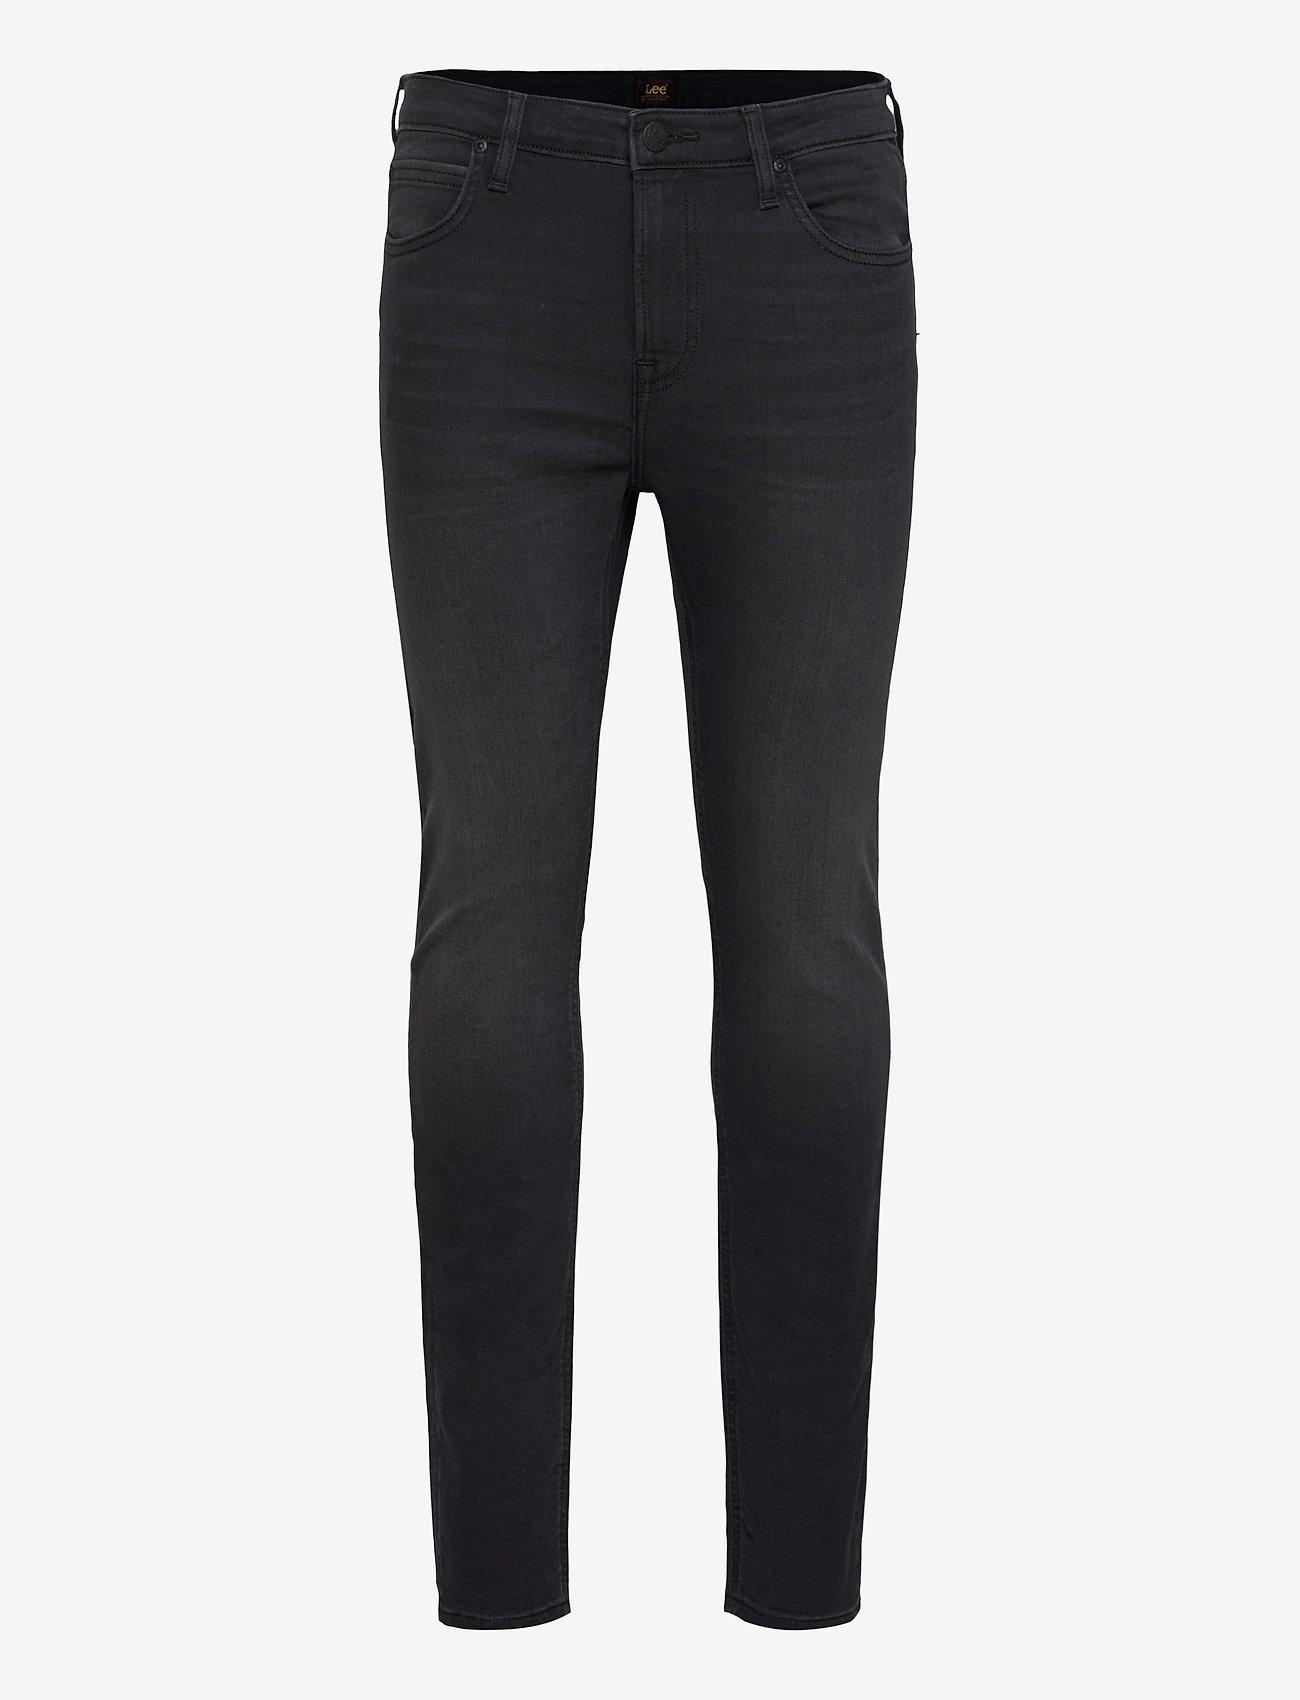 Lee Jeans - MALONE - skinny jeans - dark eden - 0